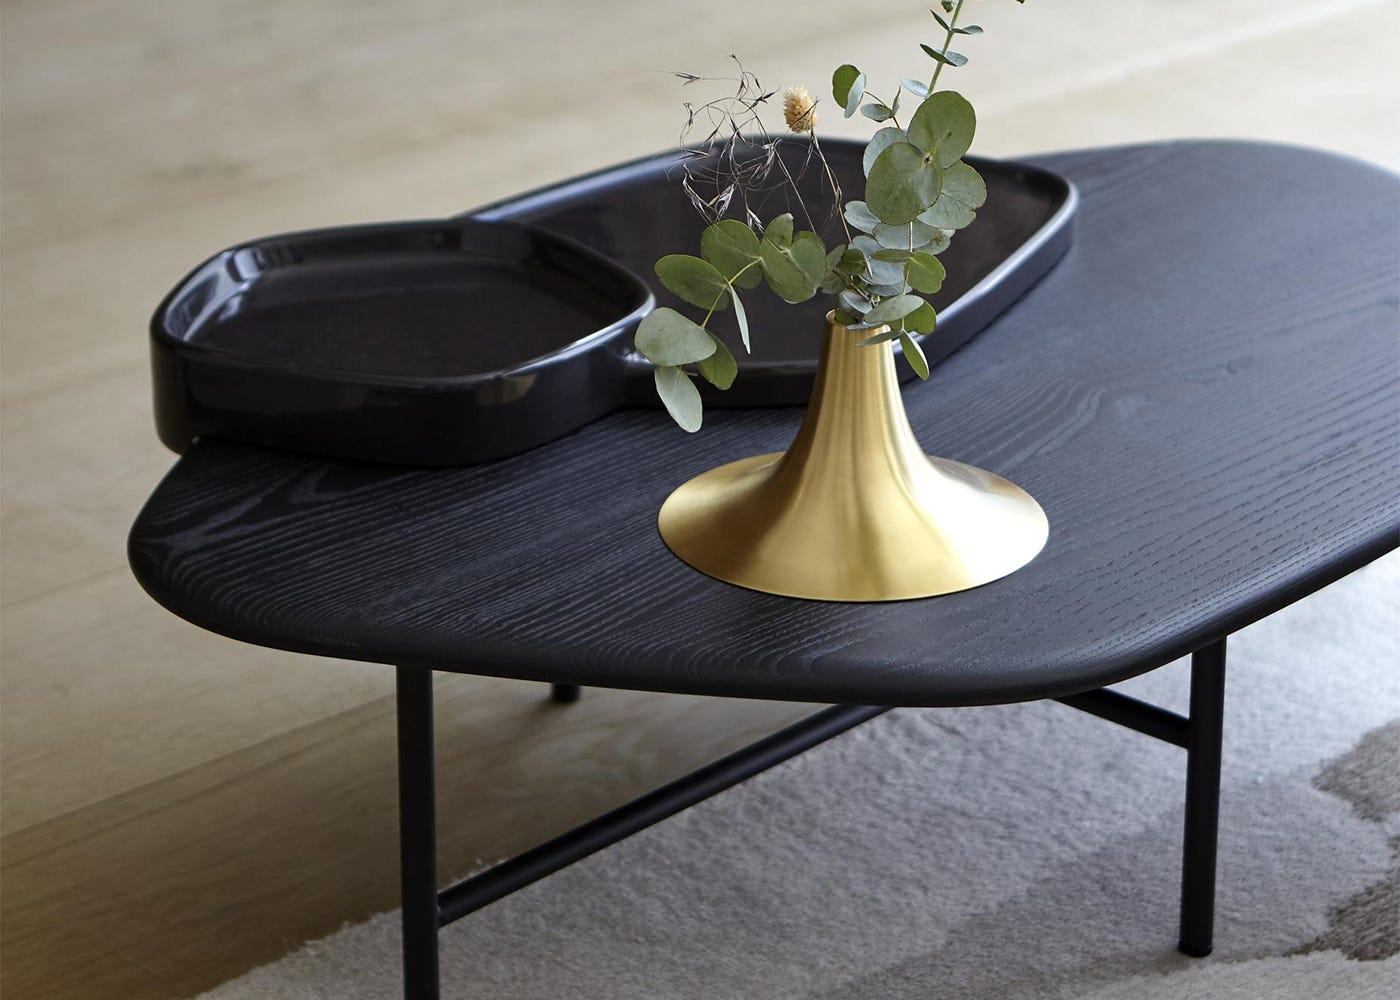 Lewa Low Coffee Table & Kaschkasch Vase